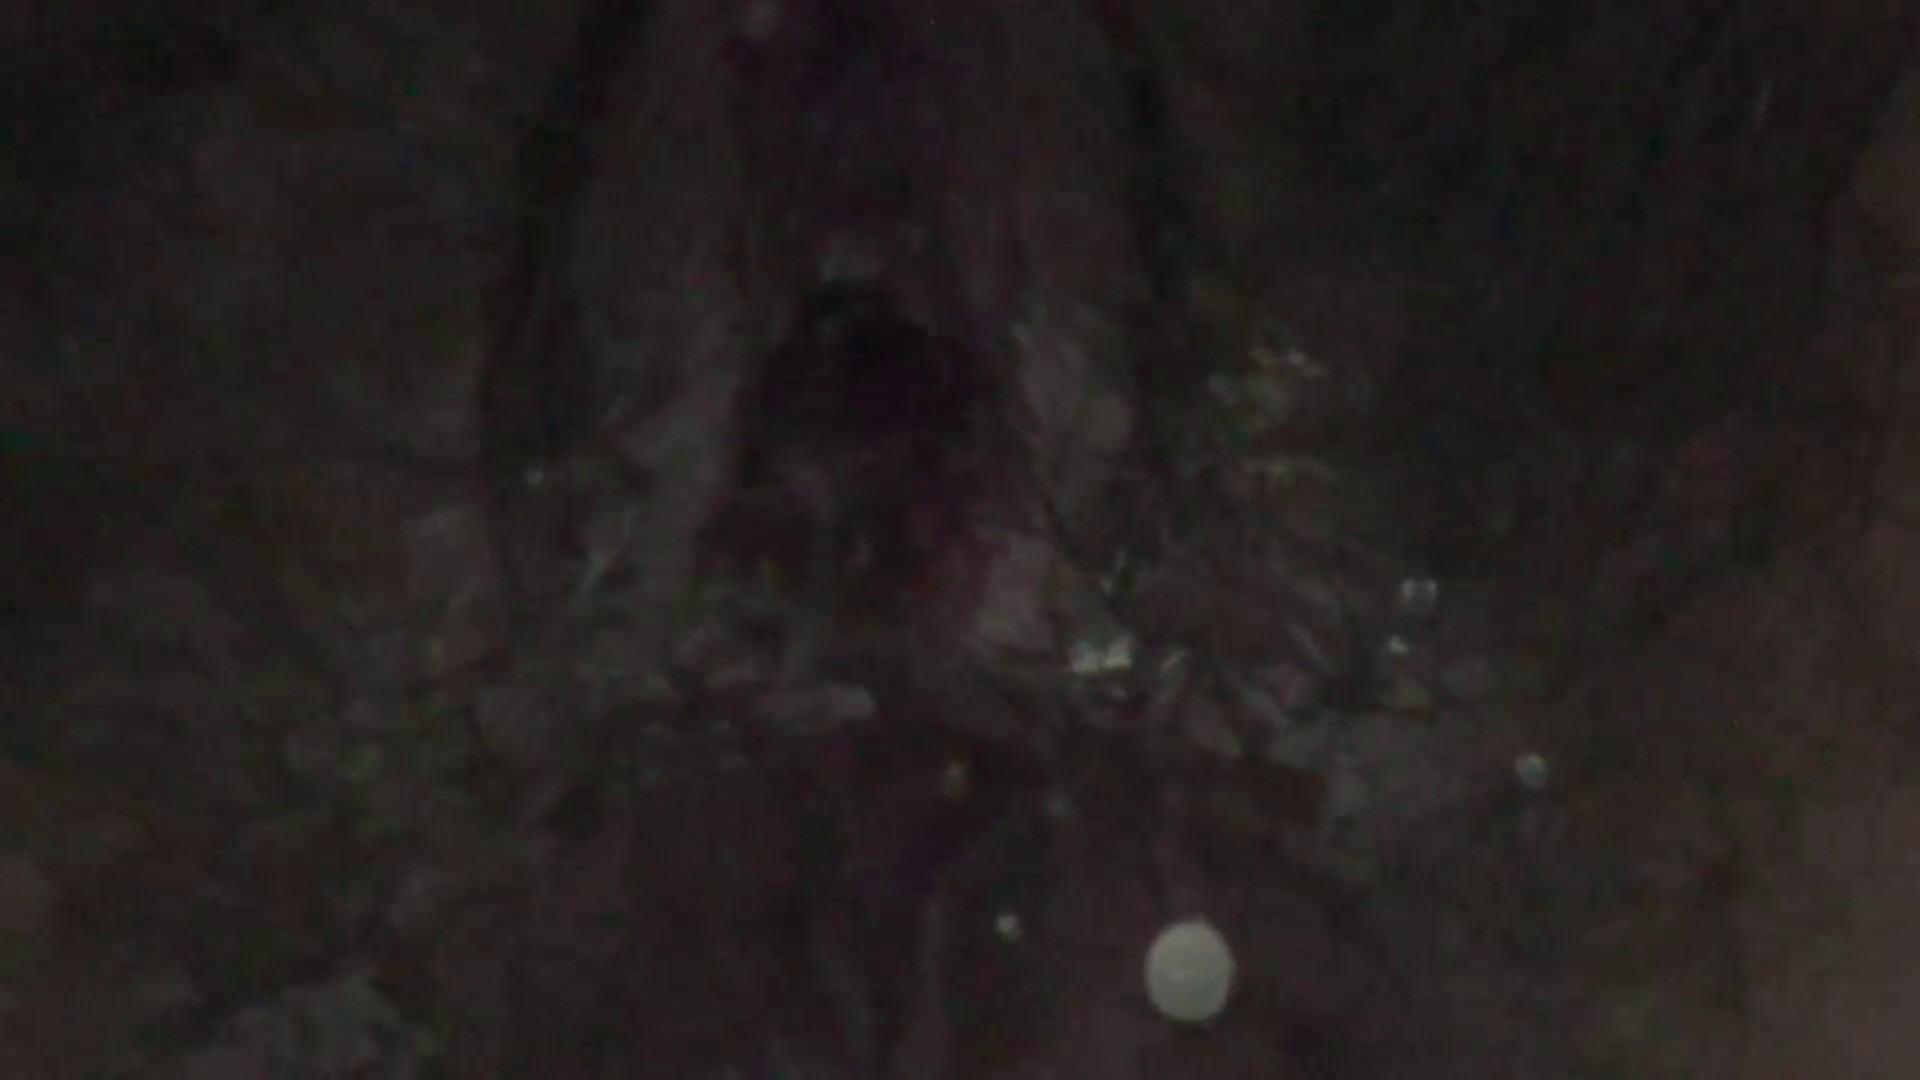 JD盗撮 美女の洗面所の秘密 Vol.28 OLの実態 | 洗面所  46pic 46